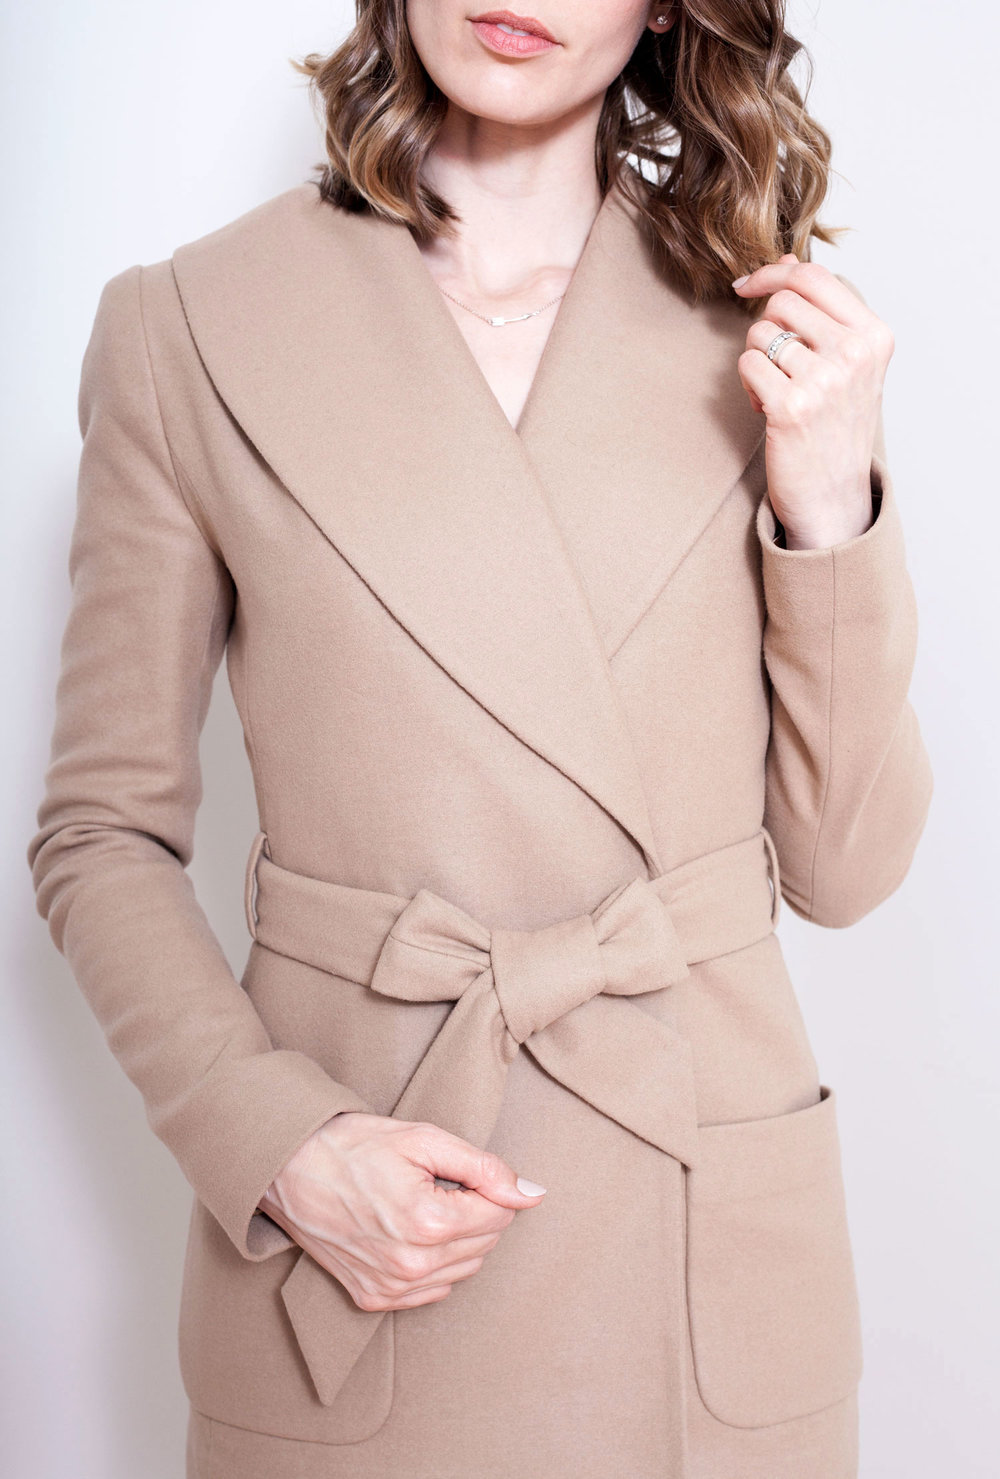 Up-Close-Shawl-Collar-Wrap-Coat-Camel.jpg